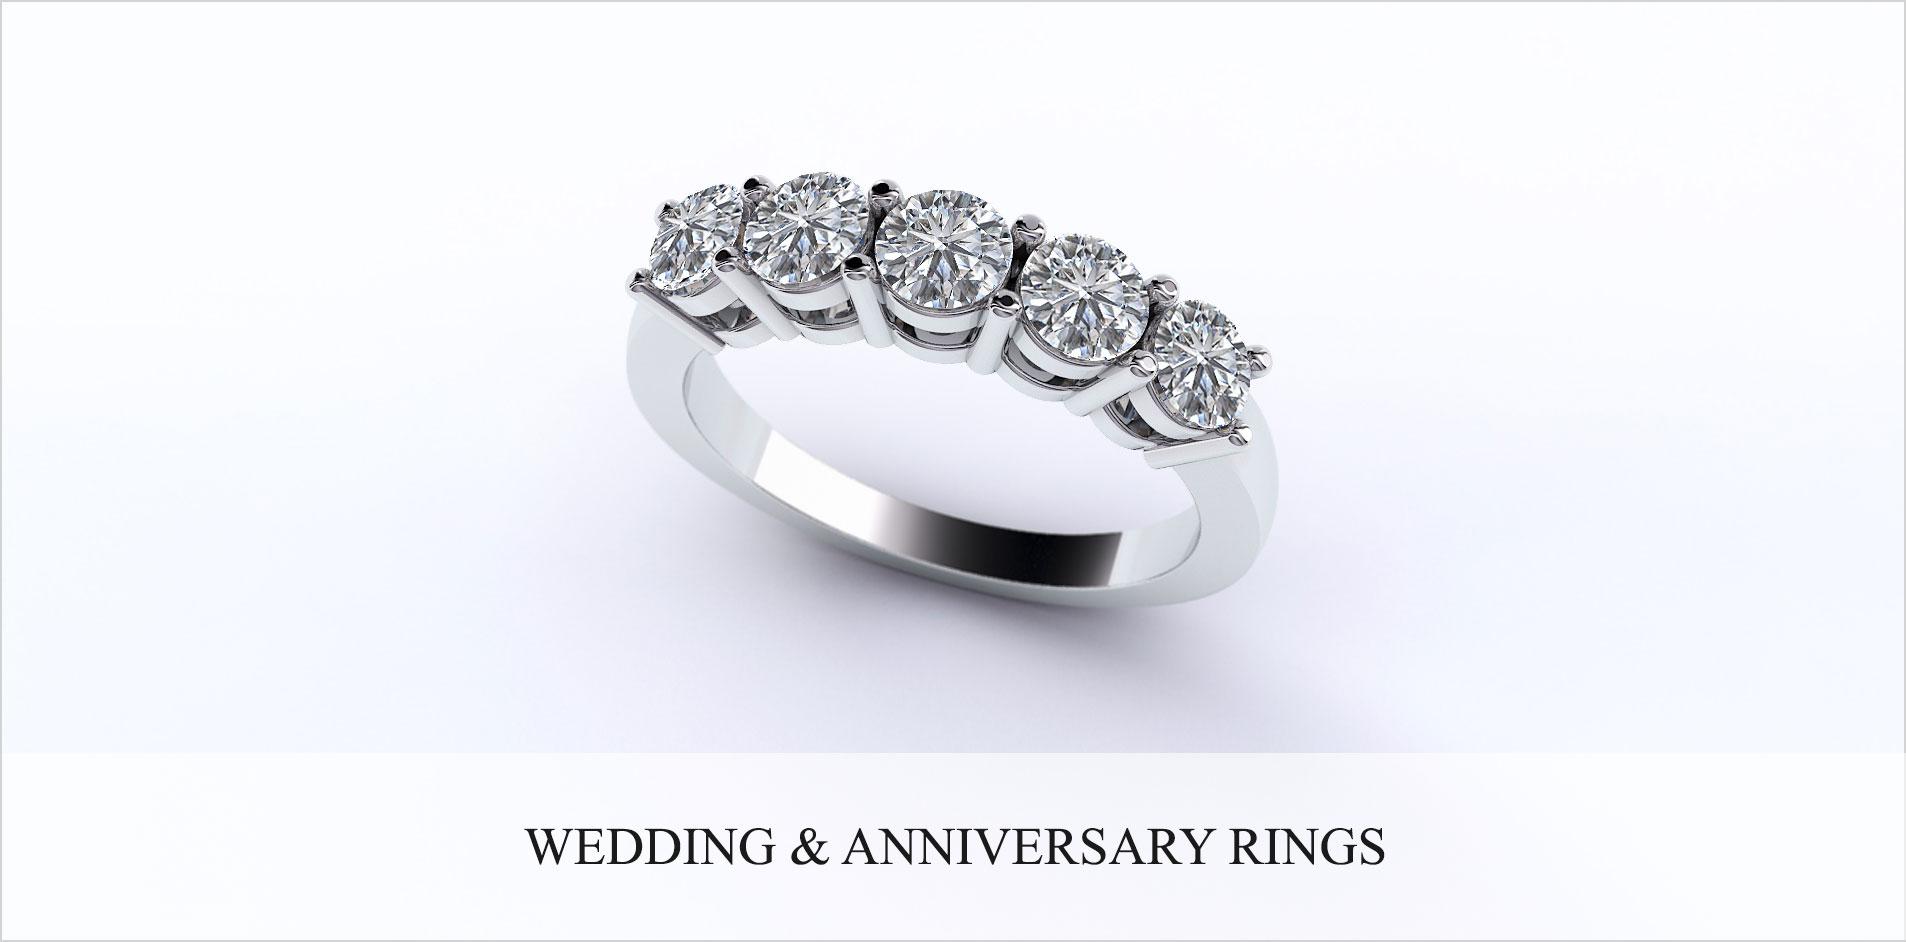 diamond engagement anniversary rings bridal wedding sets - Wedding Anniversary Rings